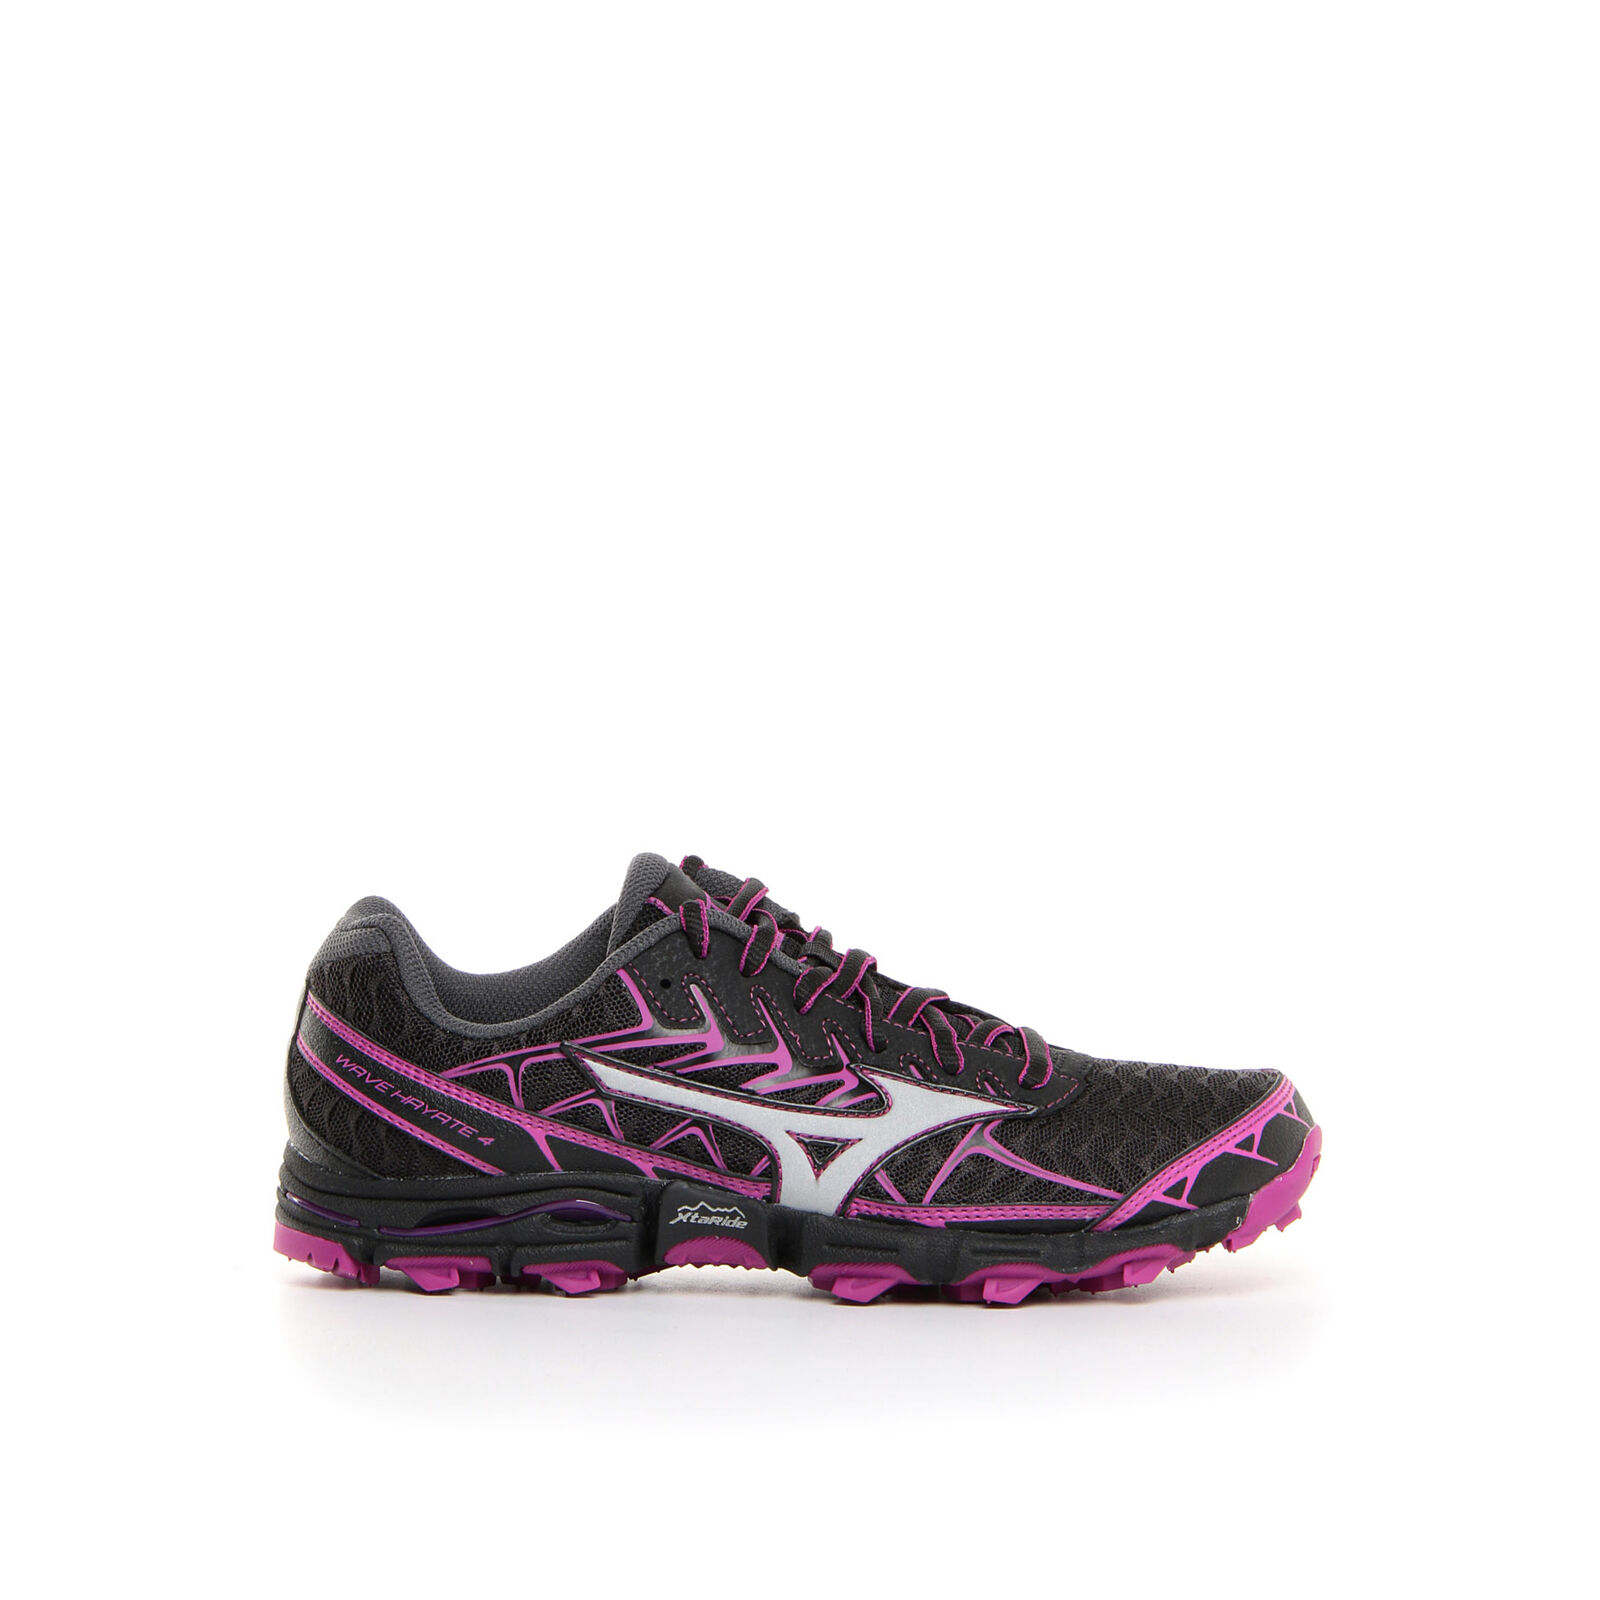 Mizuno Welle Hayate 4 W Schuhe Trail Running Doon J1GK1872 03